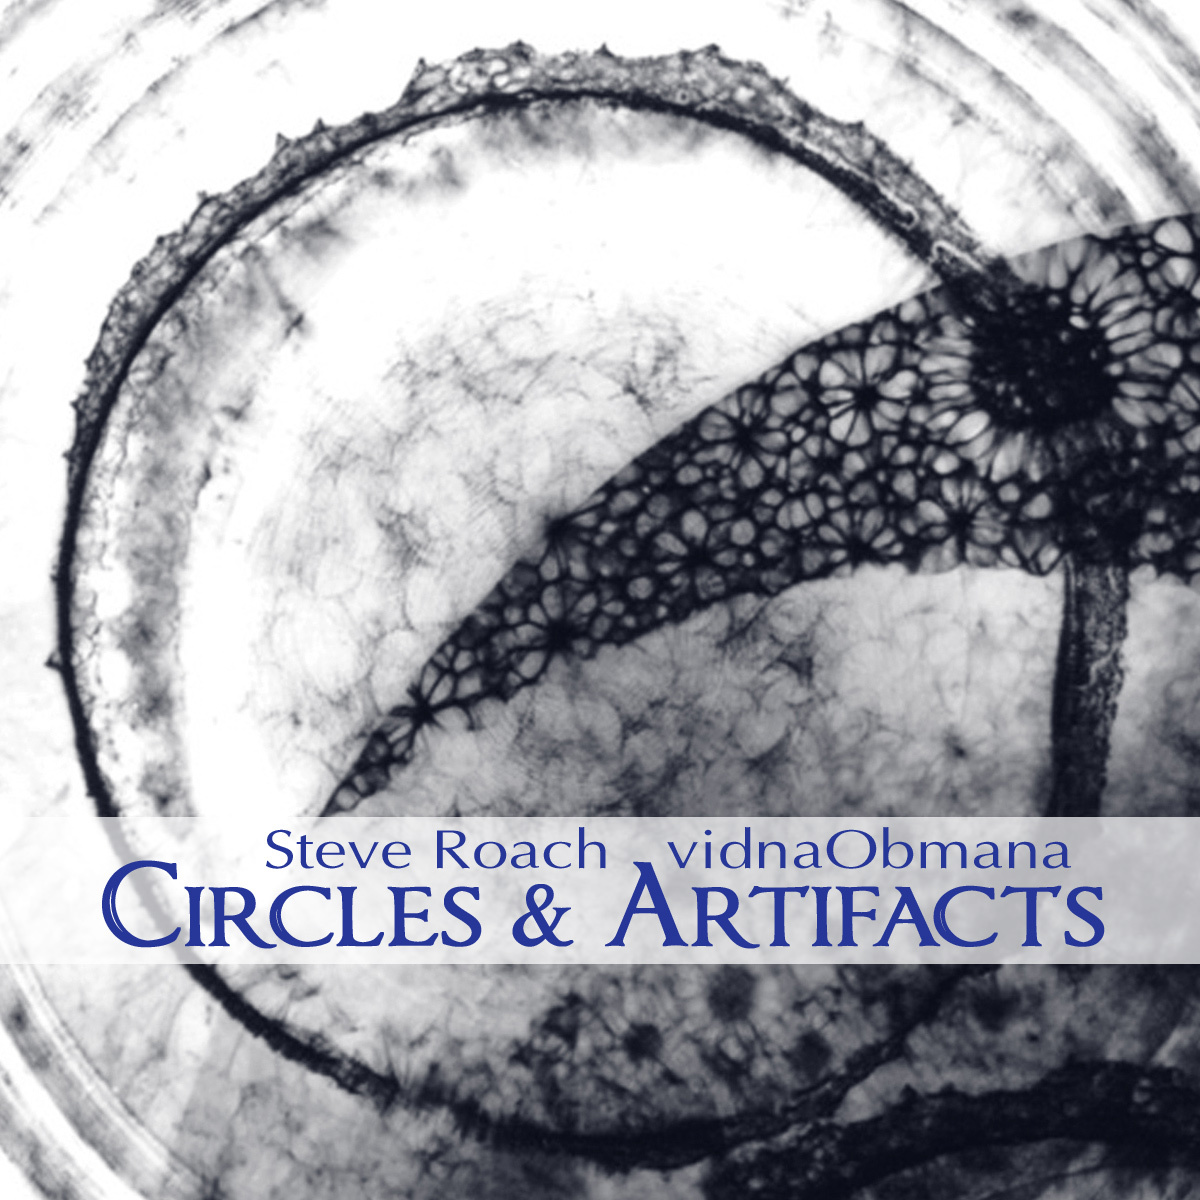 Steve Roach / vidnaObmana — Circles & Artifacts